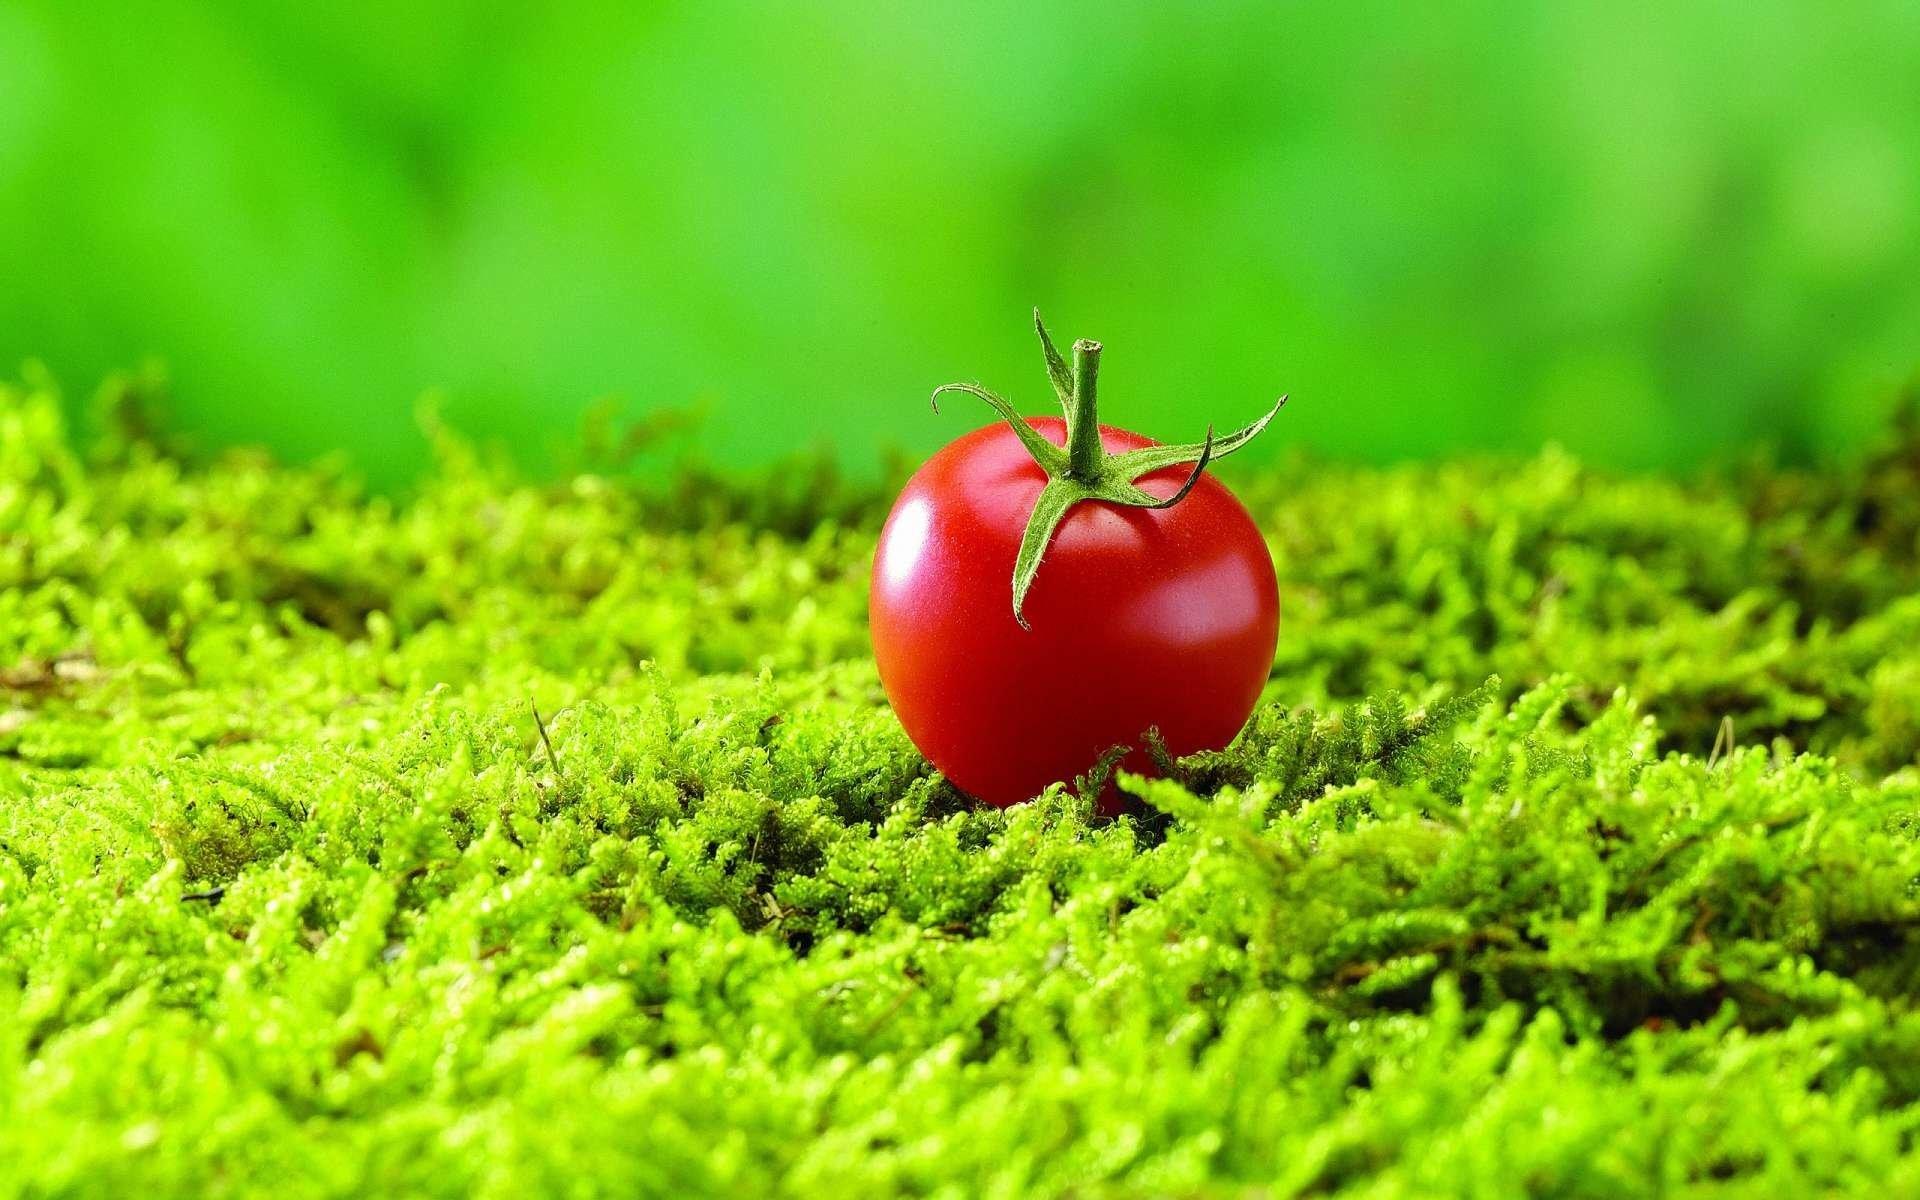 Food – Tomato Wallpaper